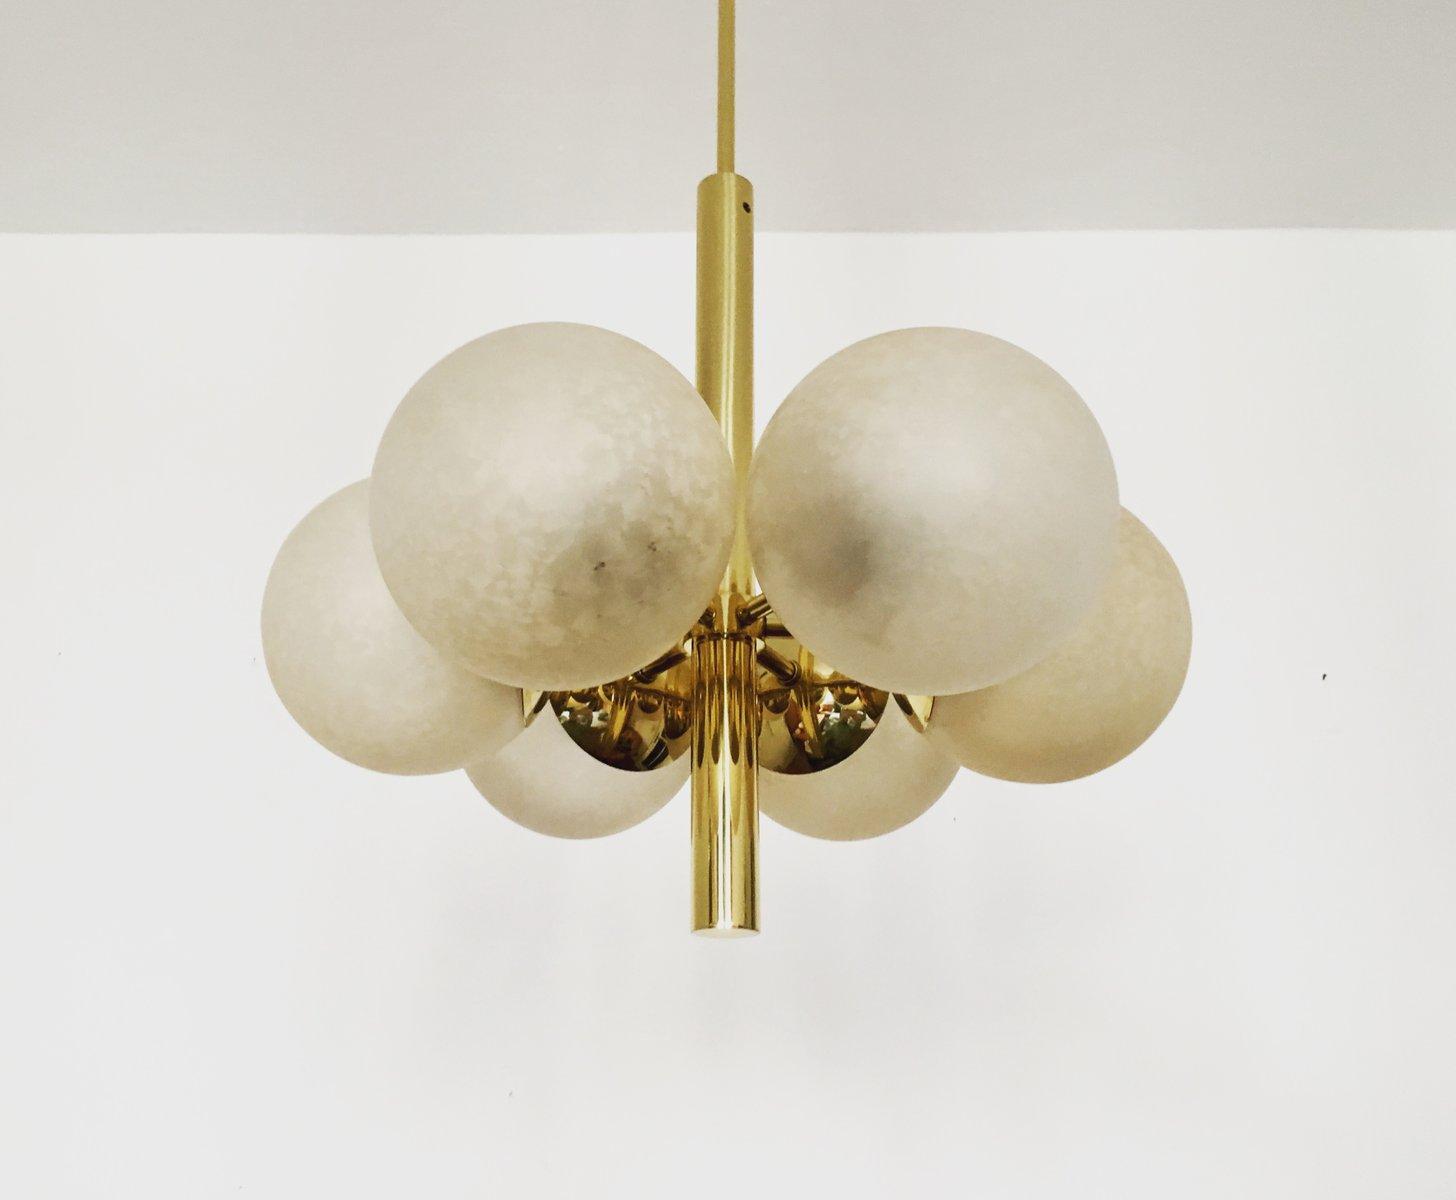 Goldener Sputnik Kronleuchter von Kaiser Leuchten, 1960er